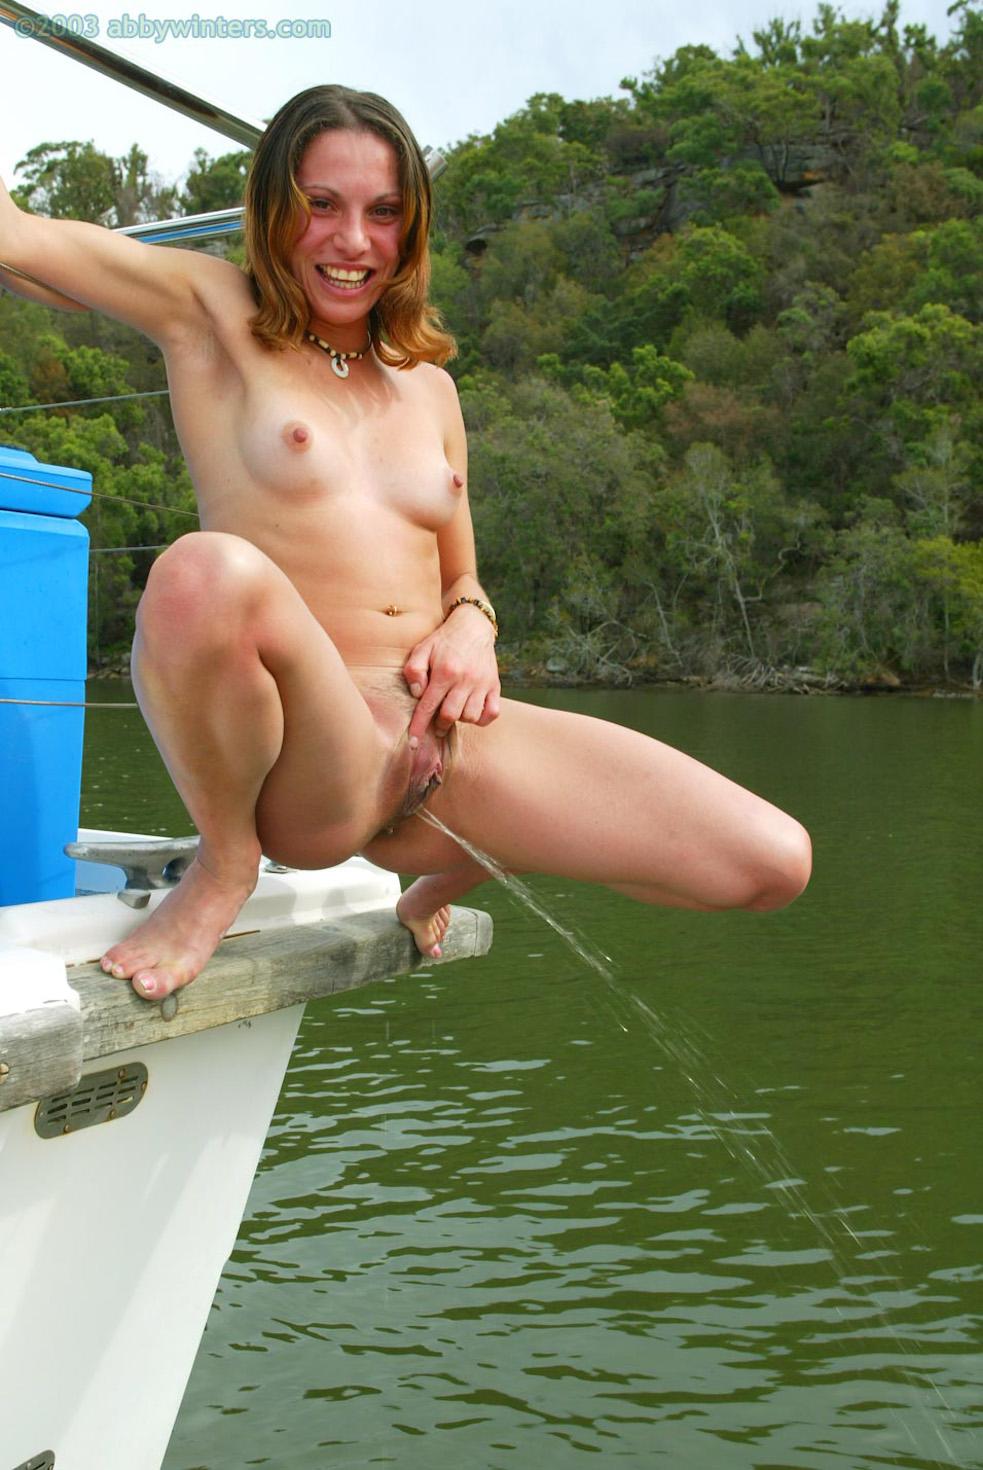 redneck girls half naked